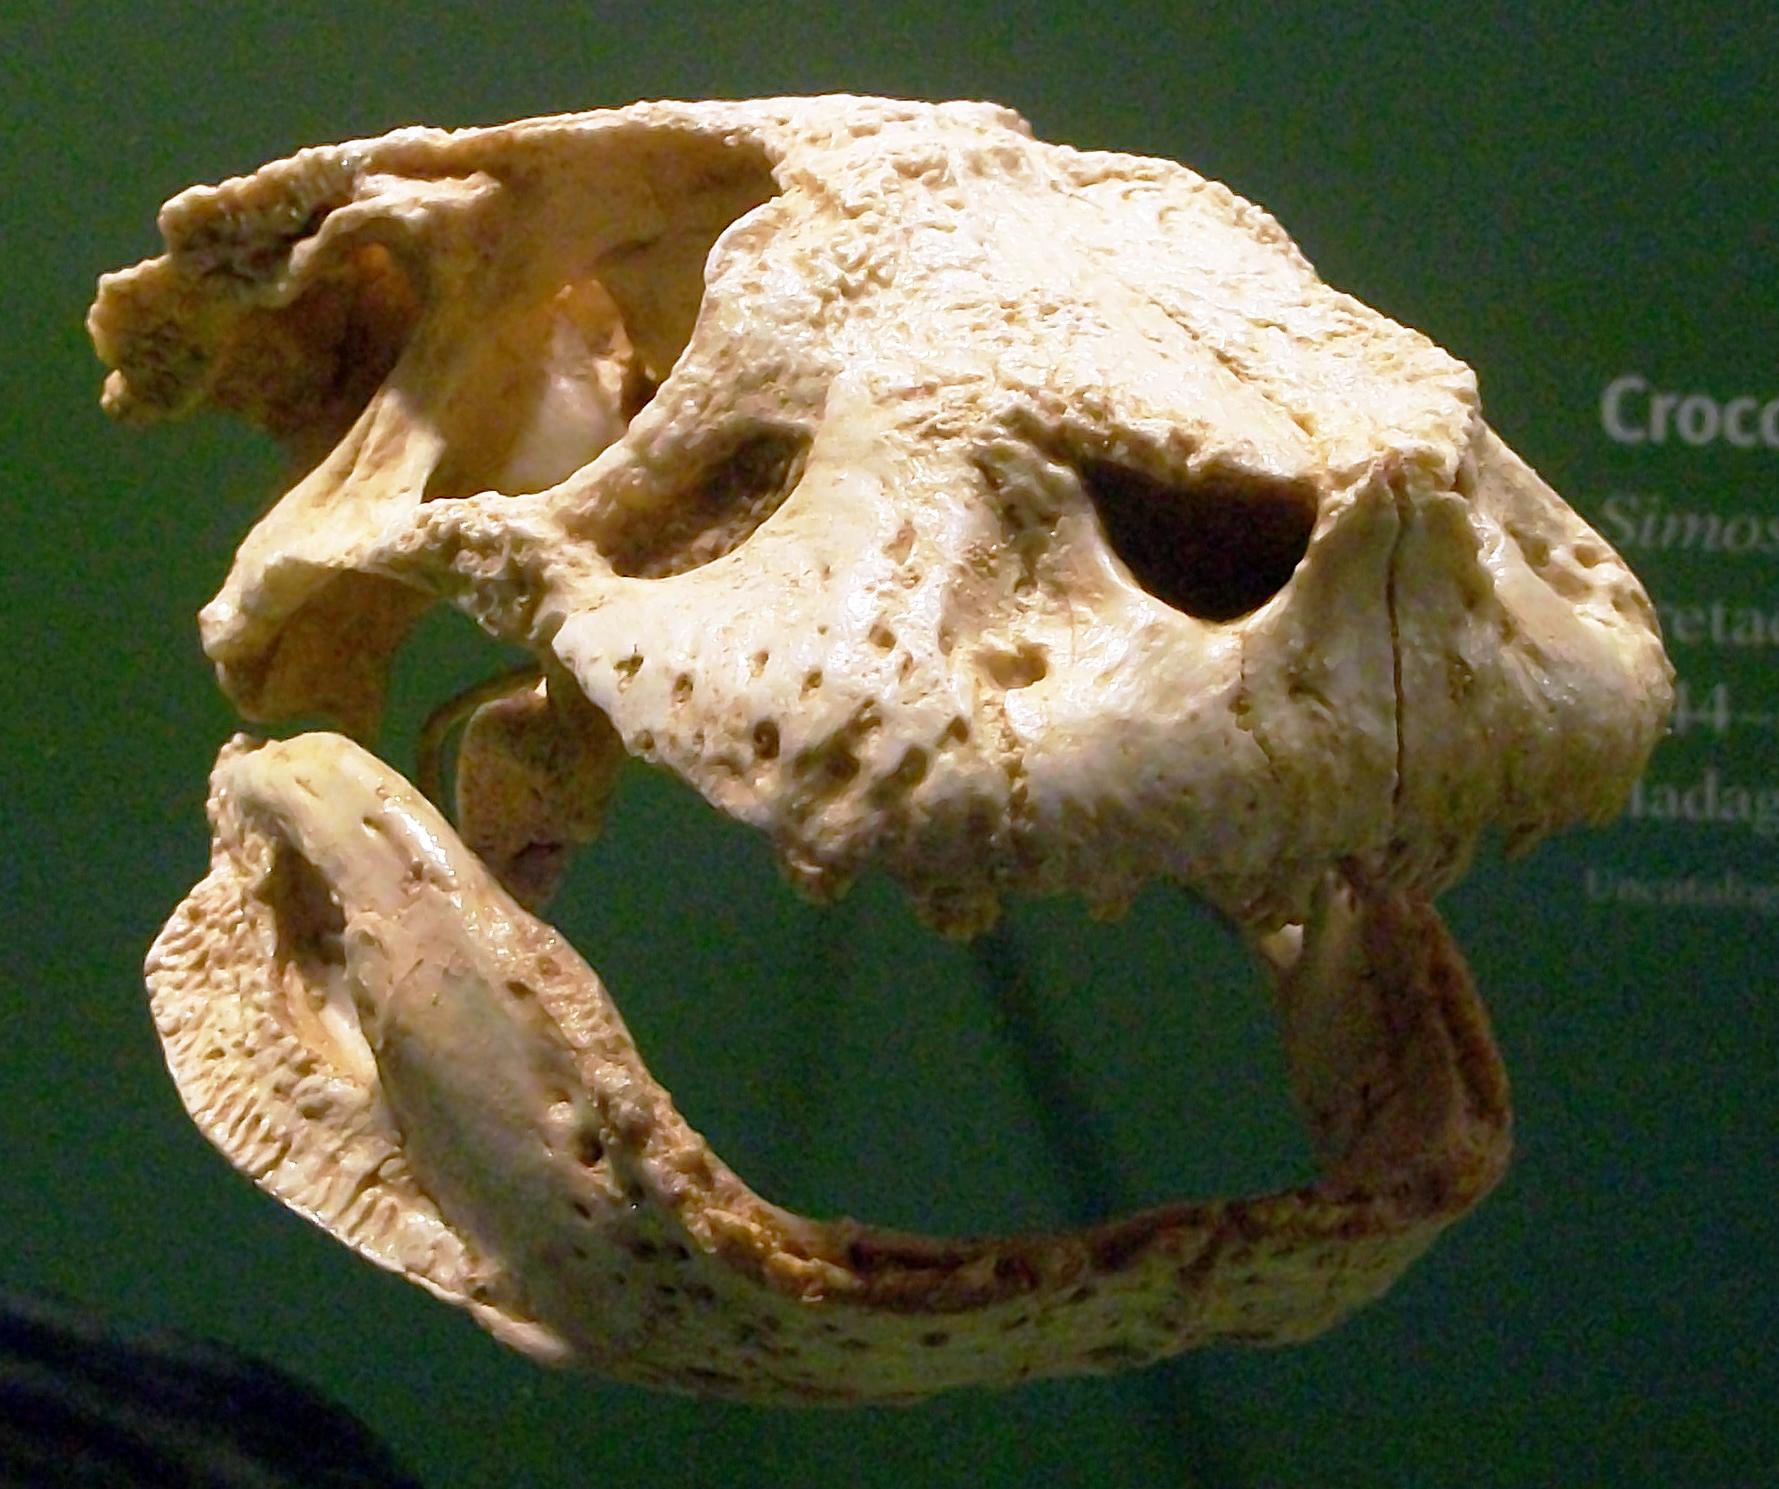 Simosuchus_clarki_skull.jpg